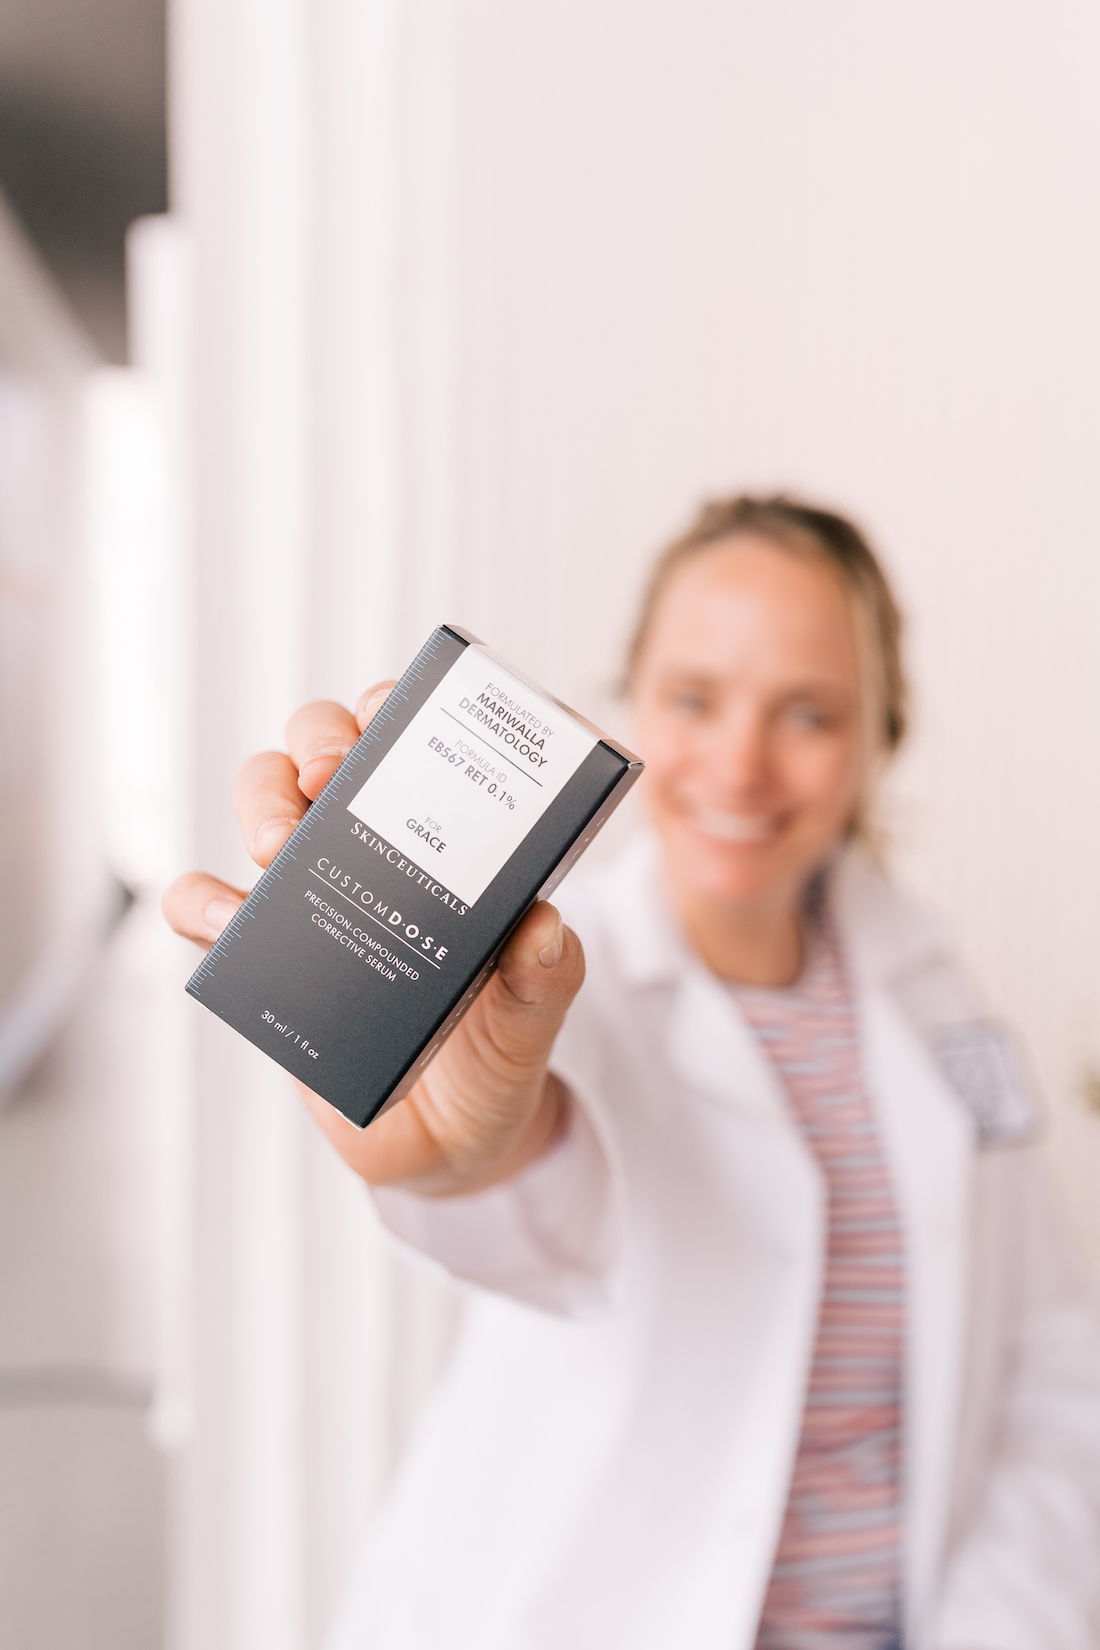 Skinceuticals Custom D.O.S.E. Serum with Mariwalla Dermatology - The Stripe